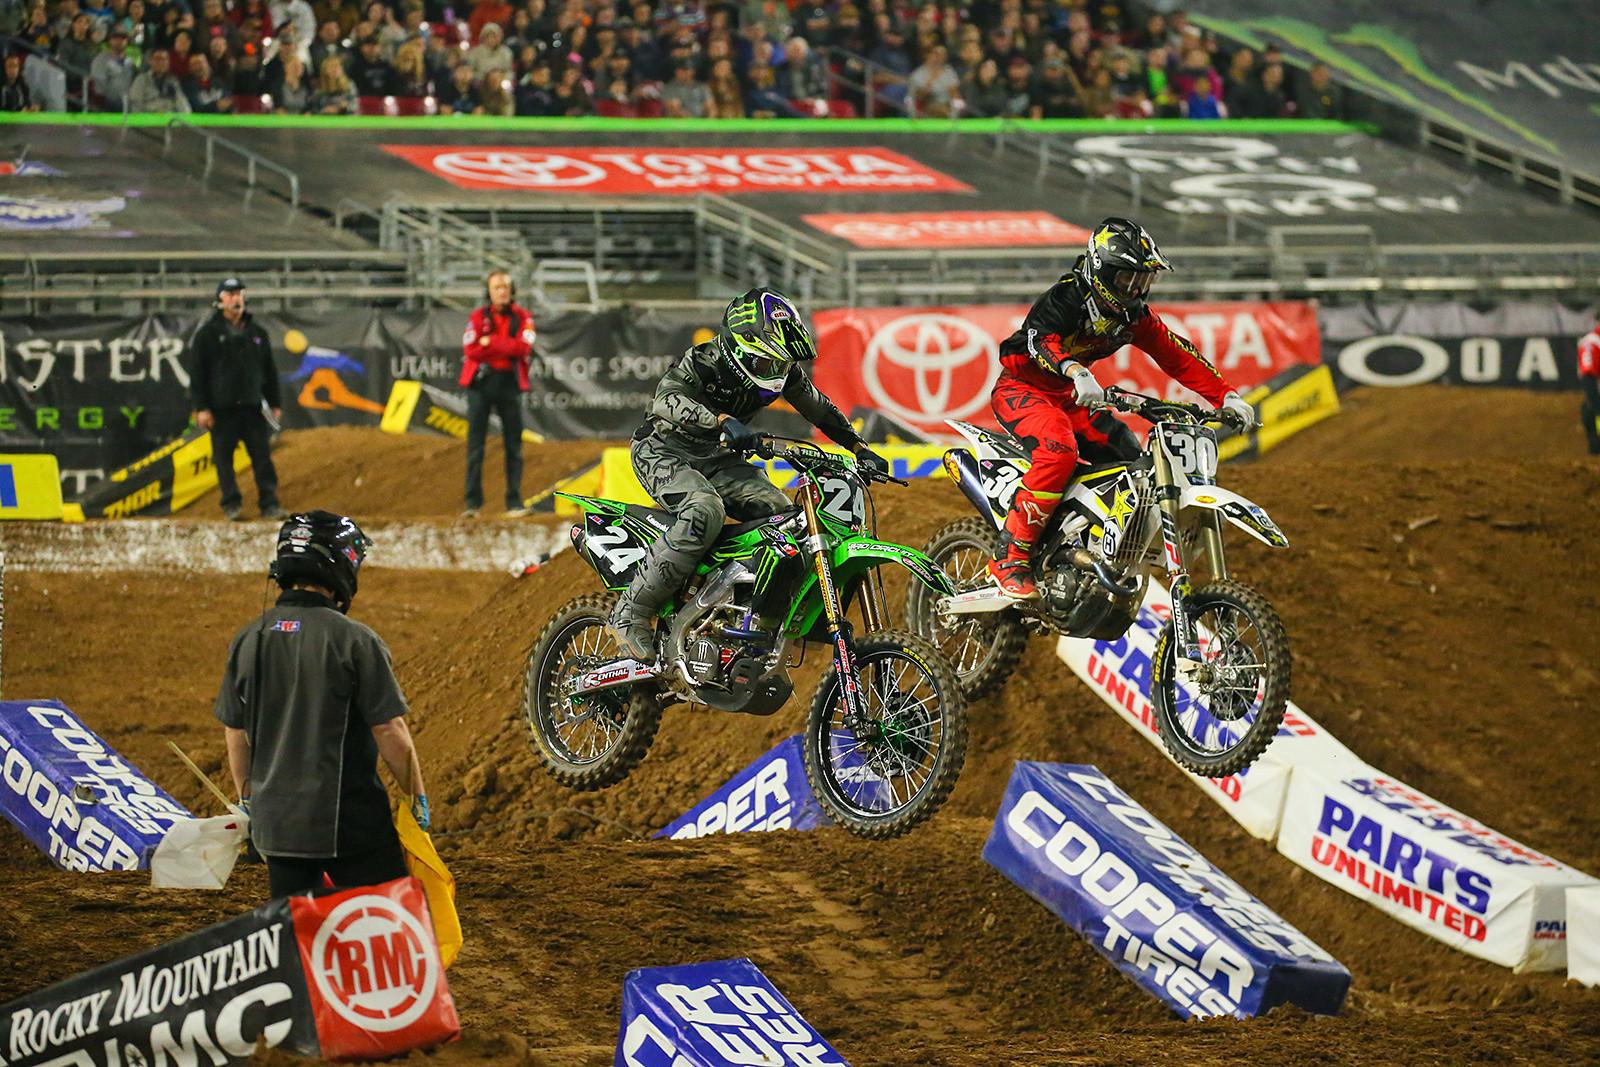 Austin Forkner and Martin Davalos - Photo Blast: Glendale - Motocross Pictures - Vital MX